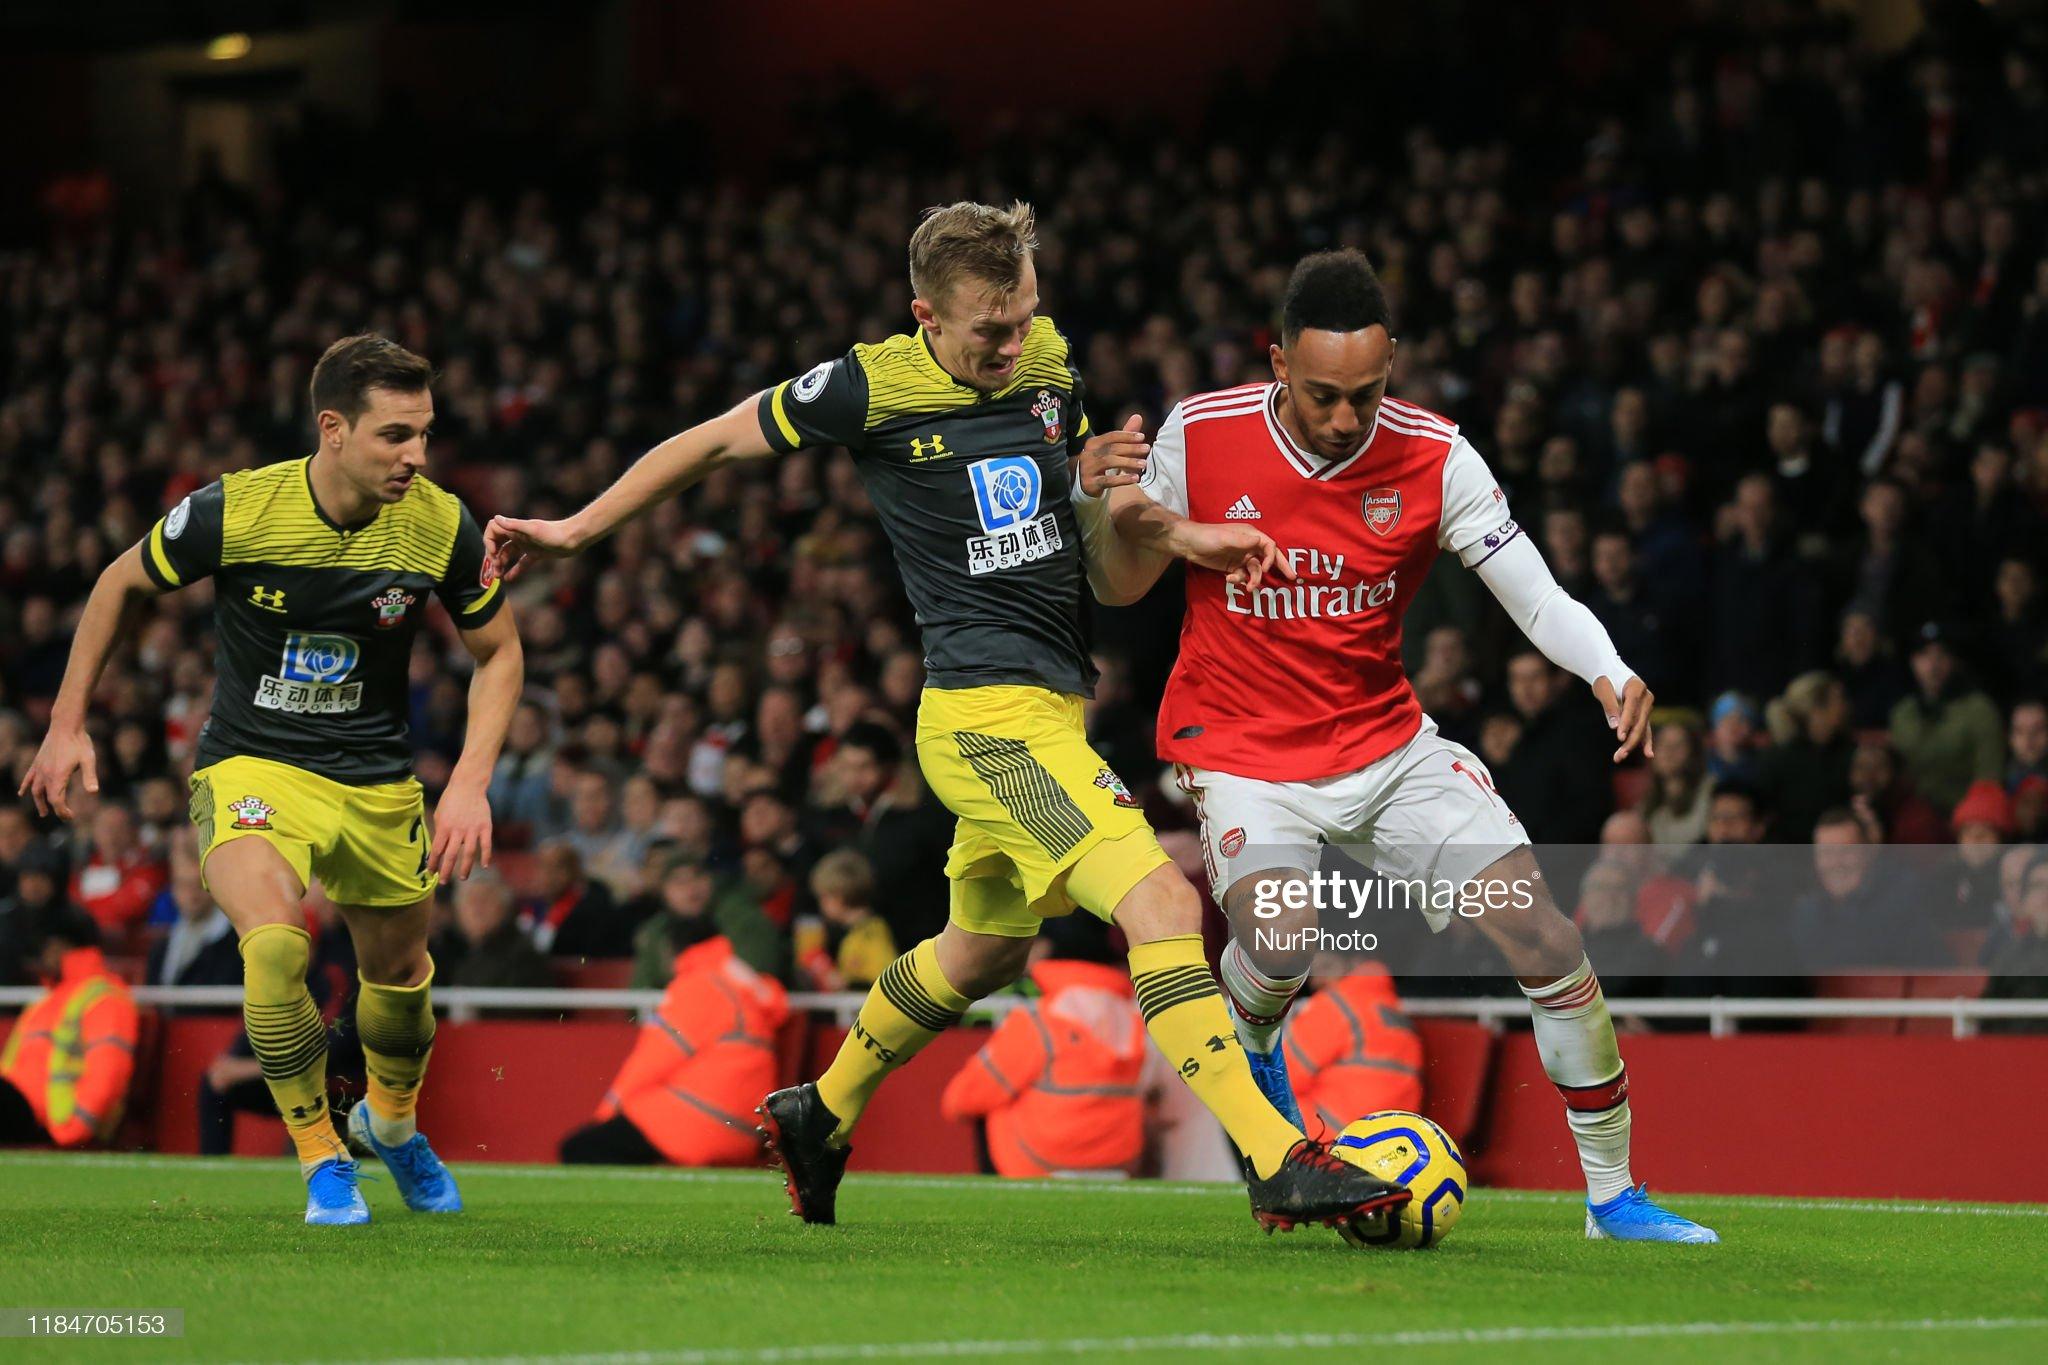 Southampton vs Arsenal Preview, prediction and odds